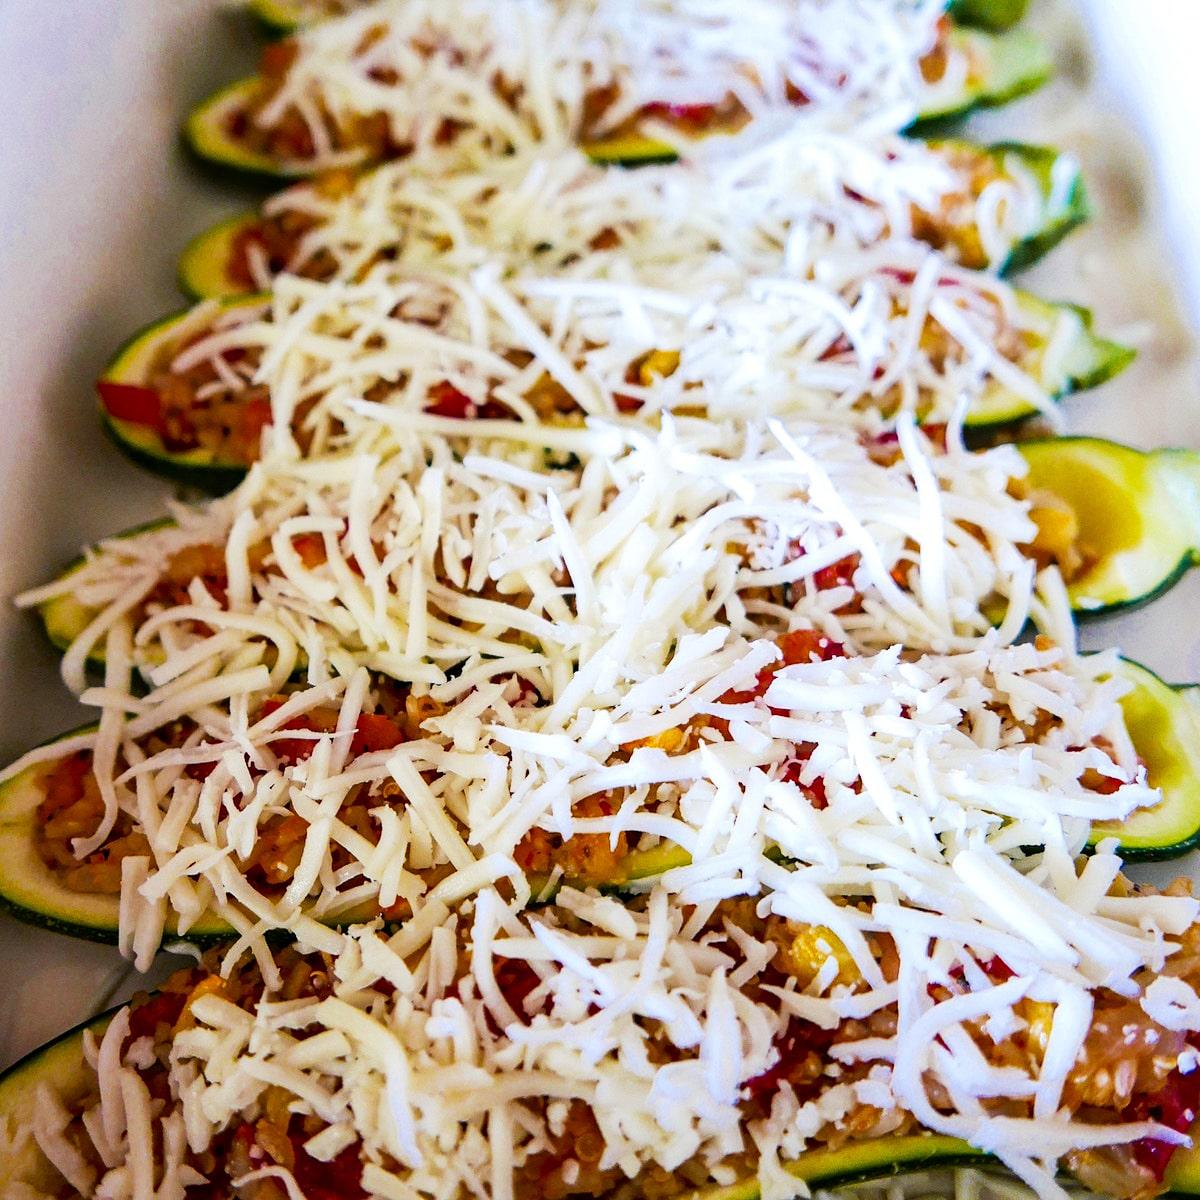 mozzarella topped zucchini on a baking sheet